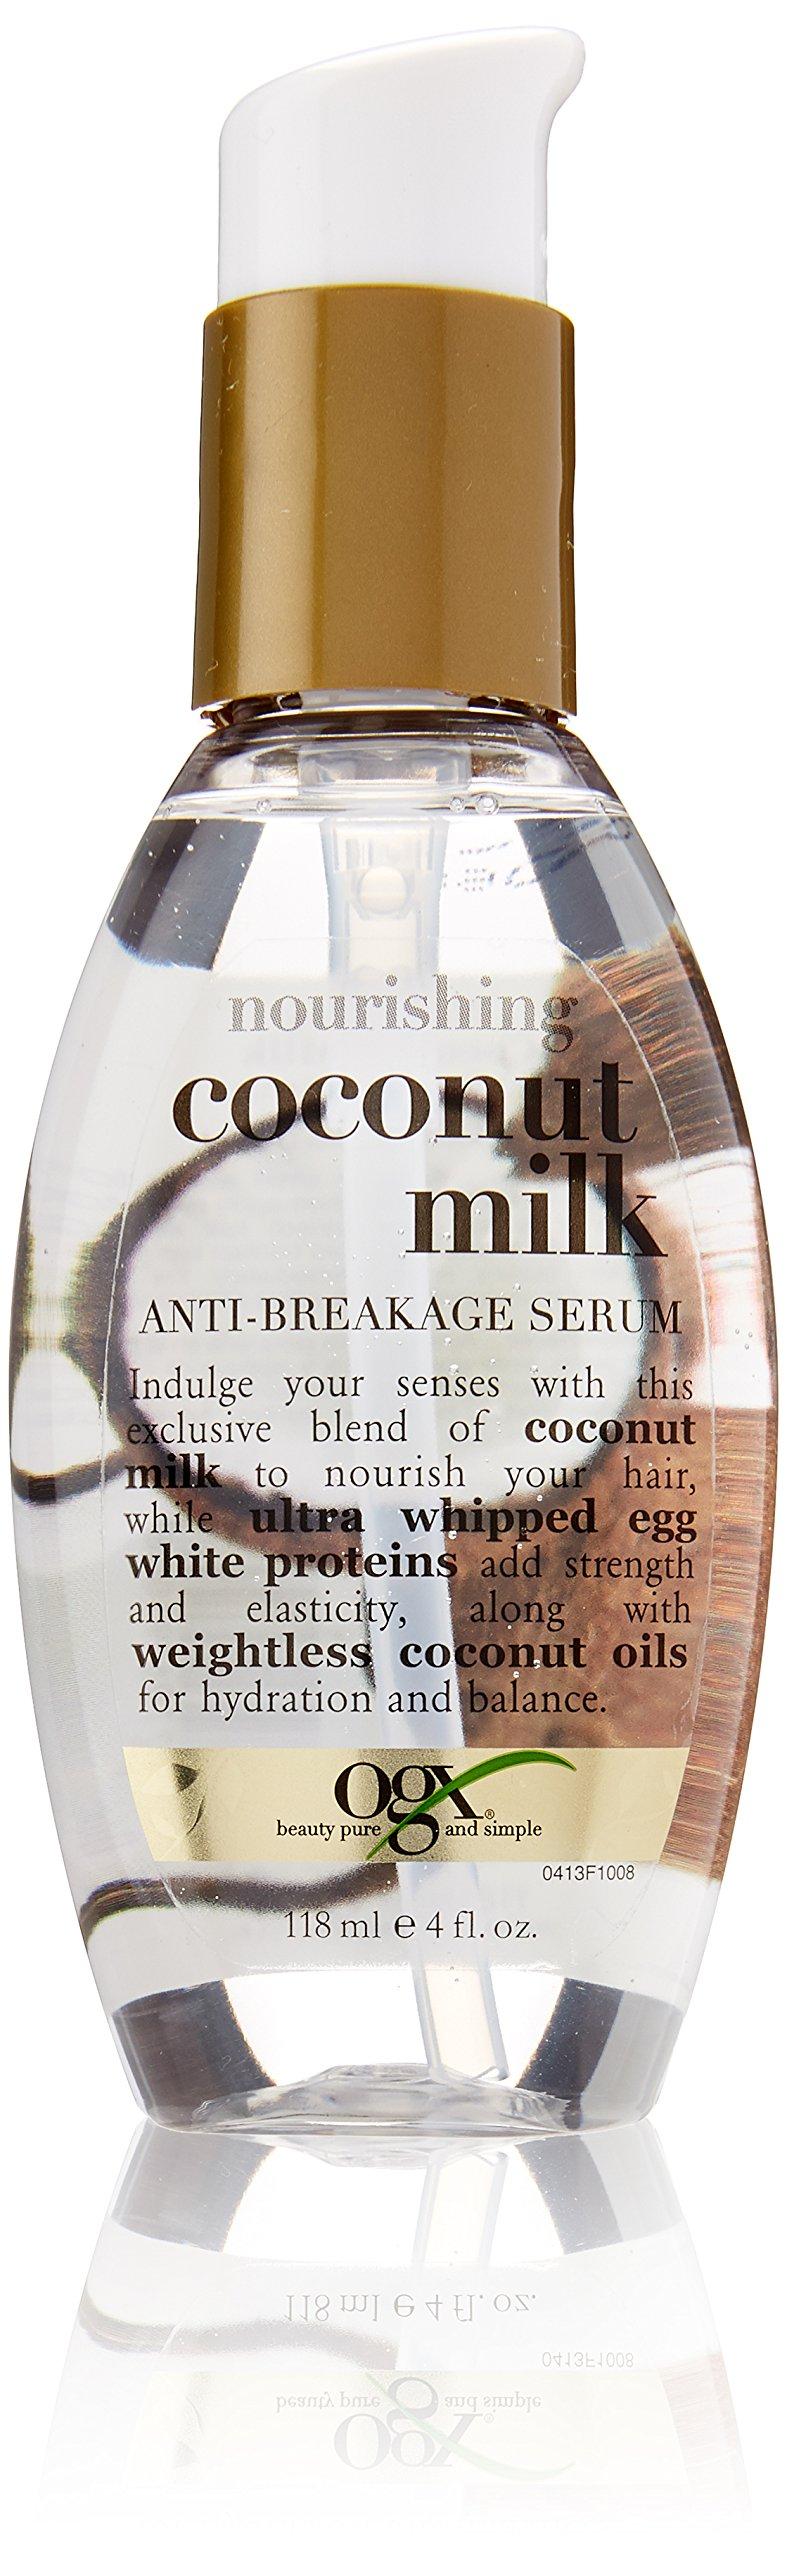 OGX Nourishing Coconut Milk Anti-Breakage Serum, 4 Ounce (Pack of 2)